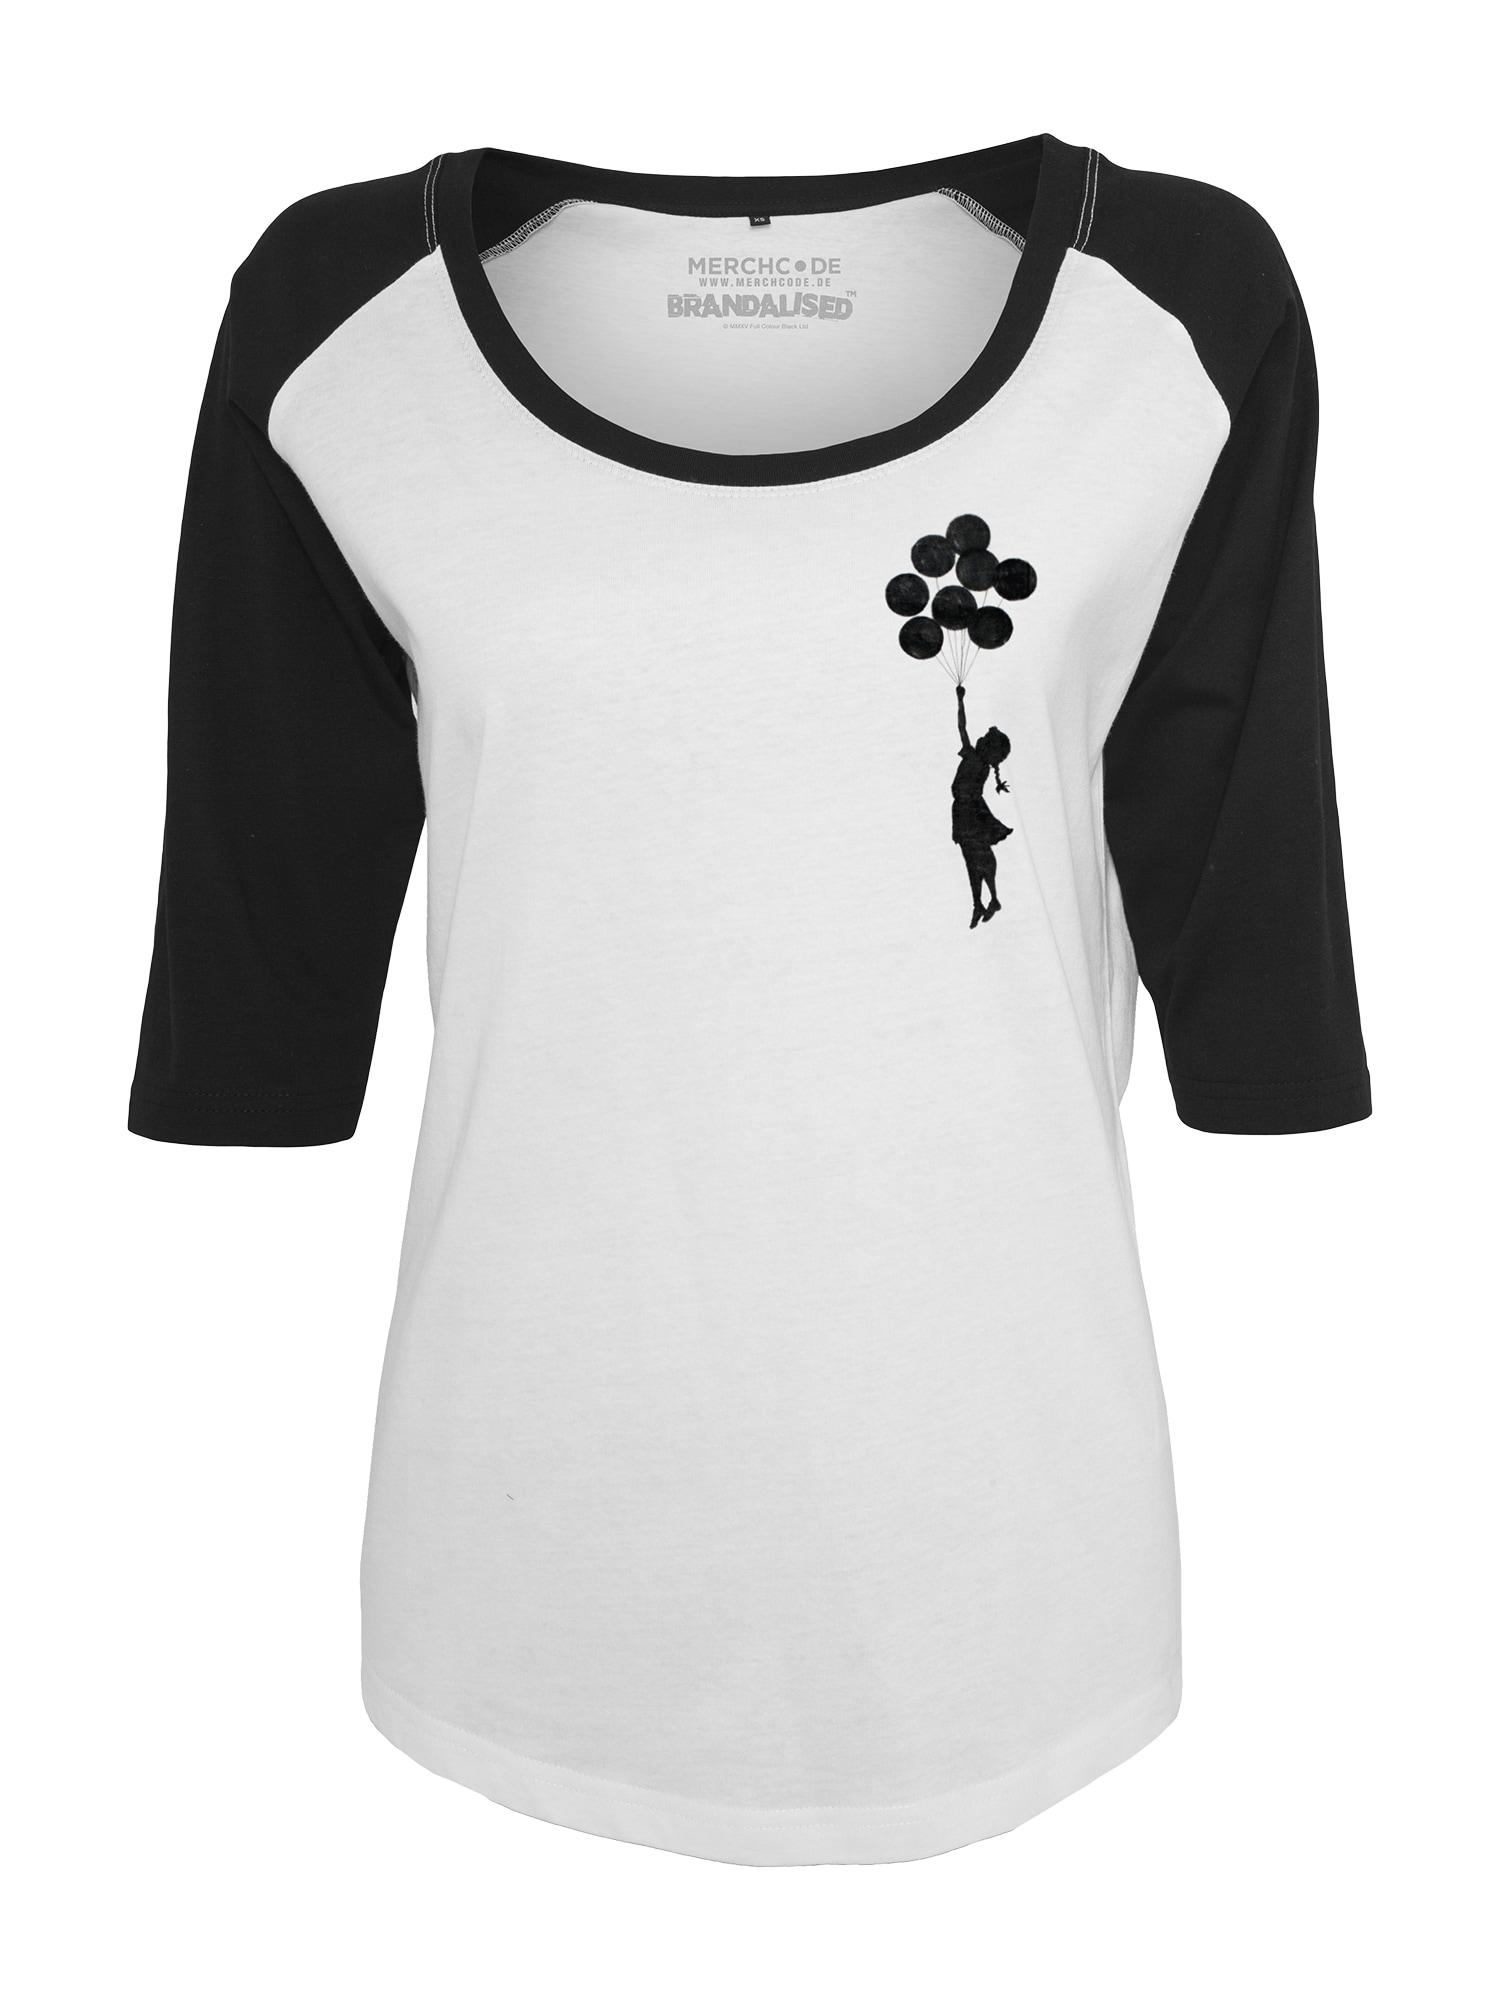 Tričko Banksy Balloons černá bílá Merchcode